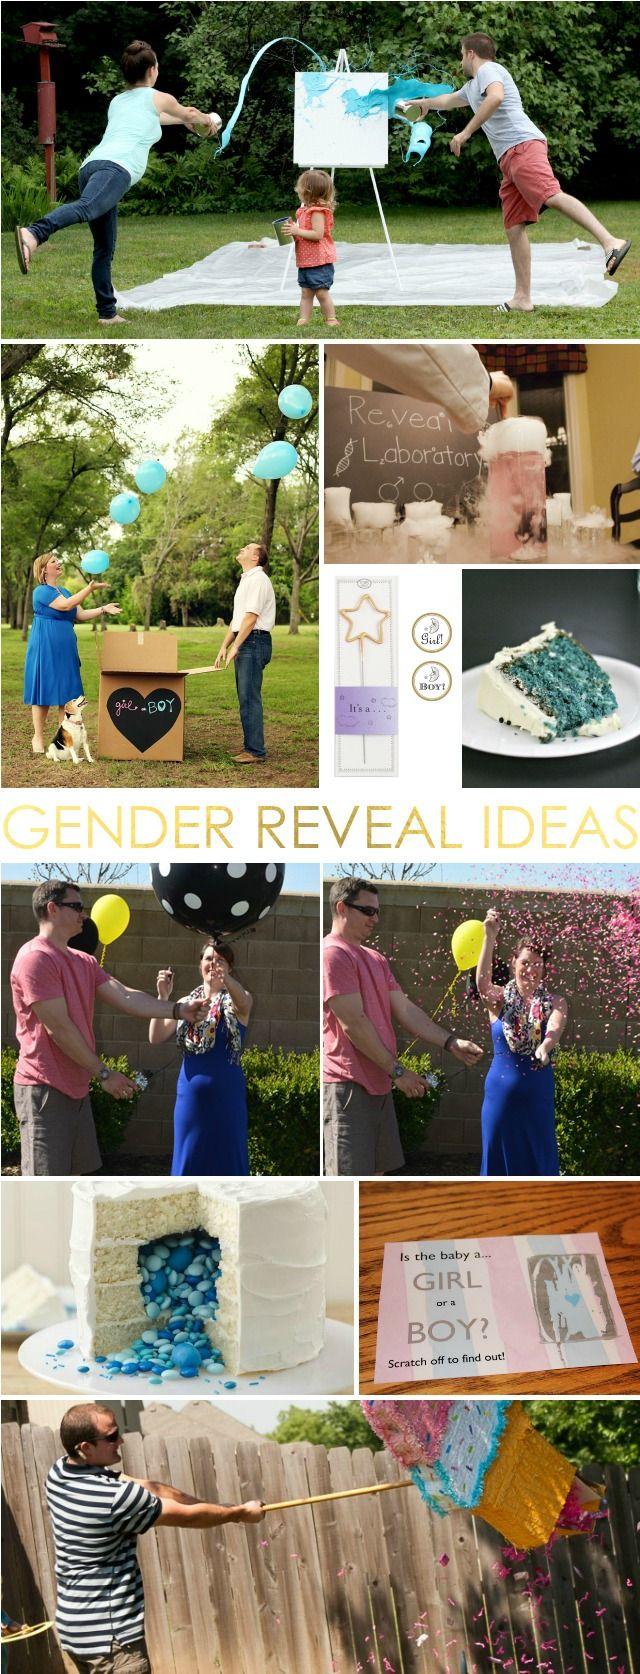 10 Adorable Gender Reveal Ideas   Project Nursery